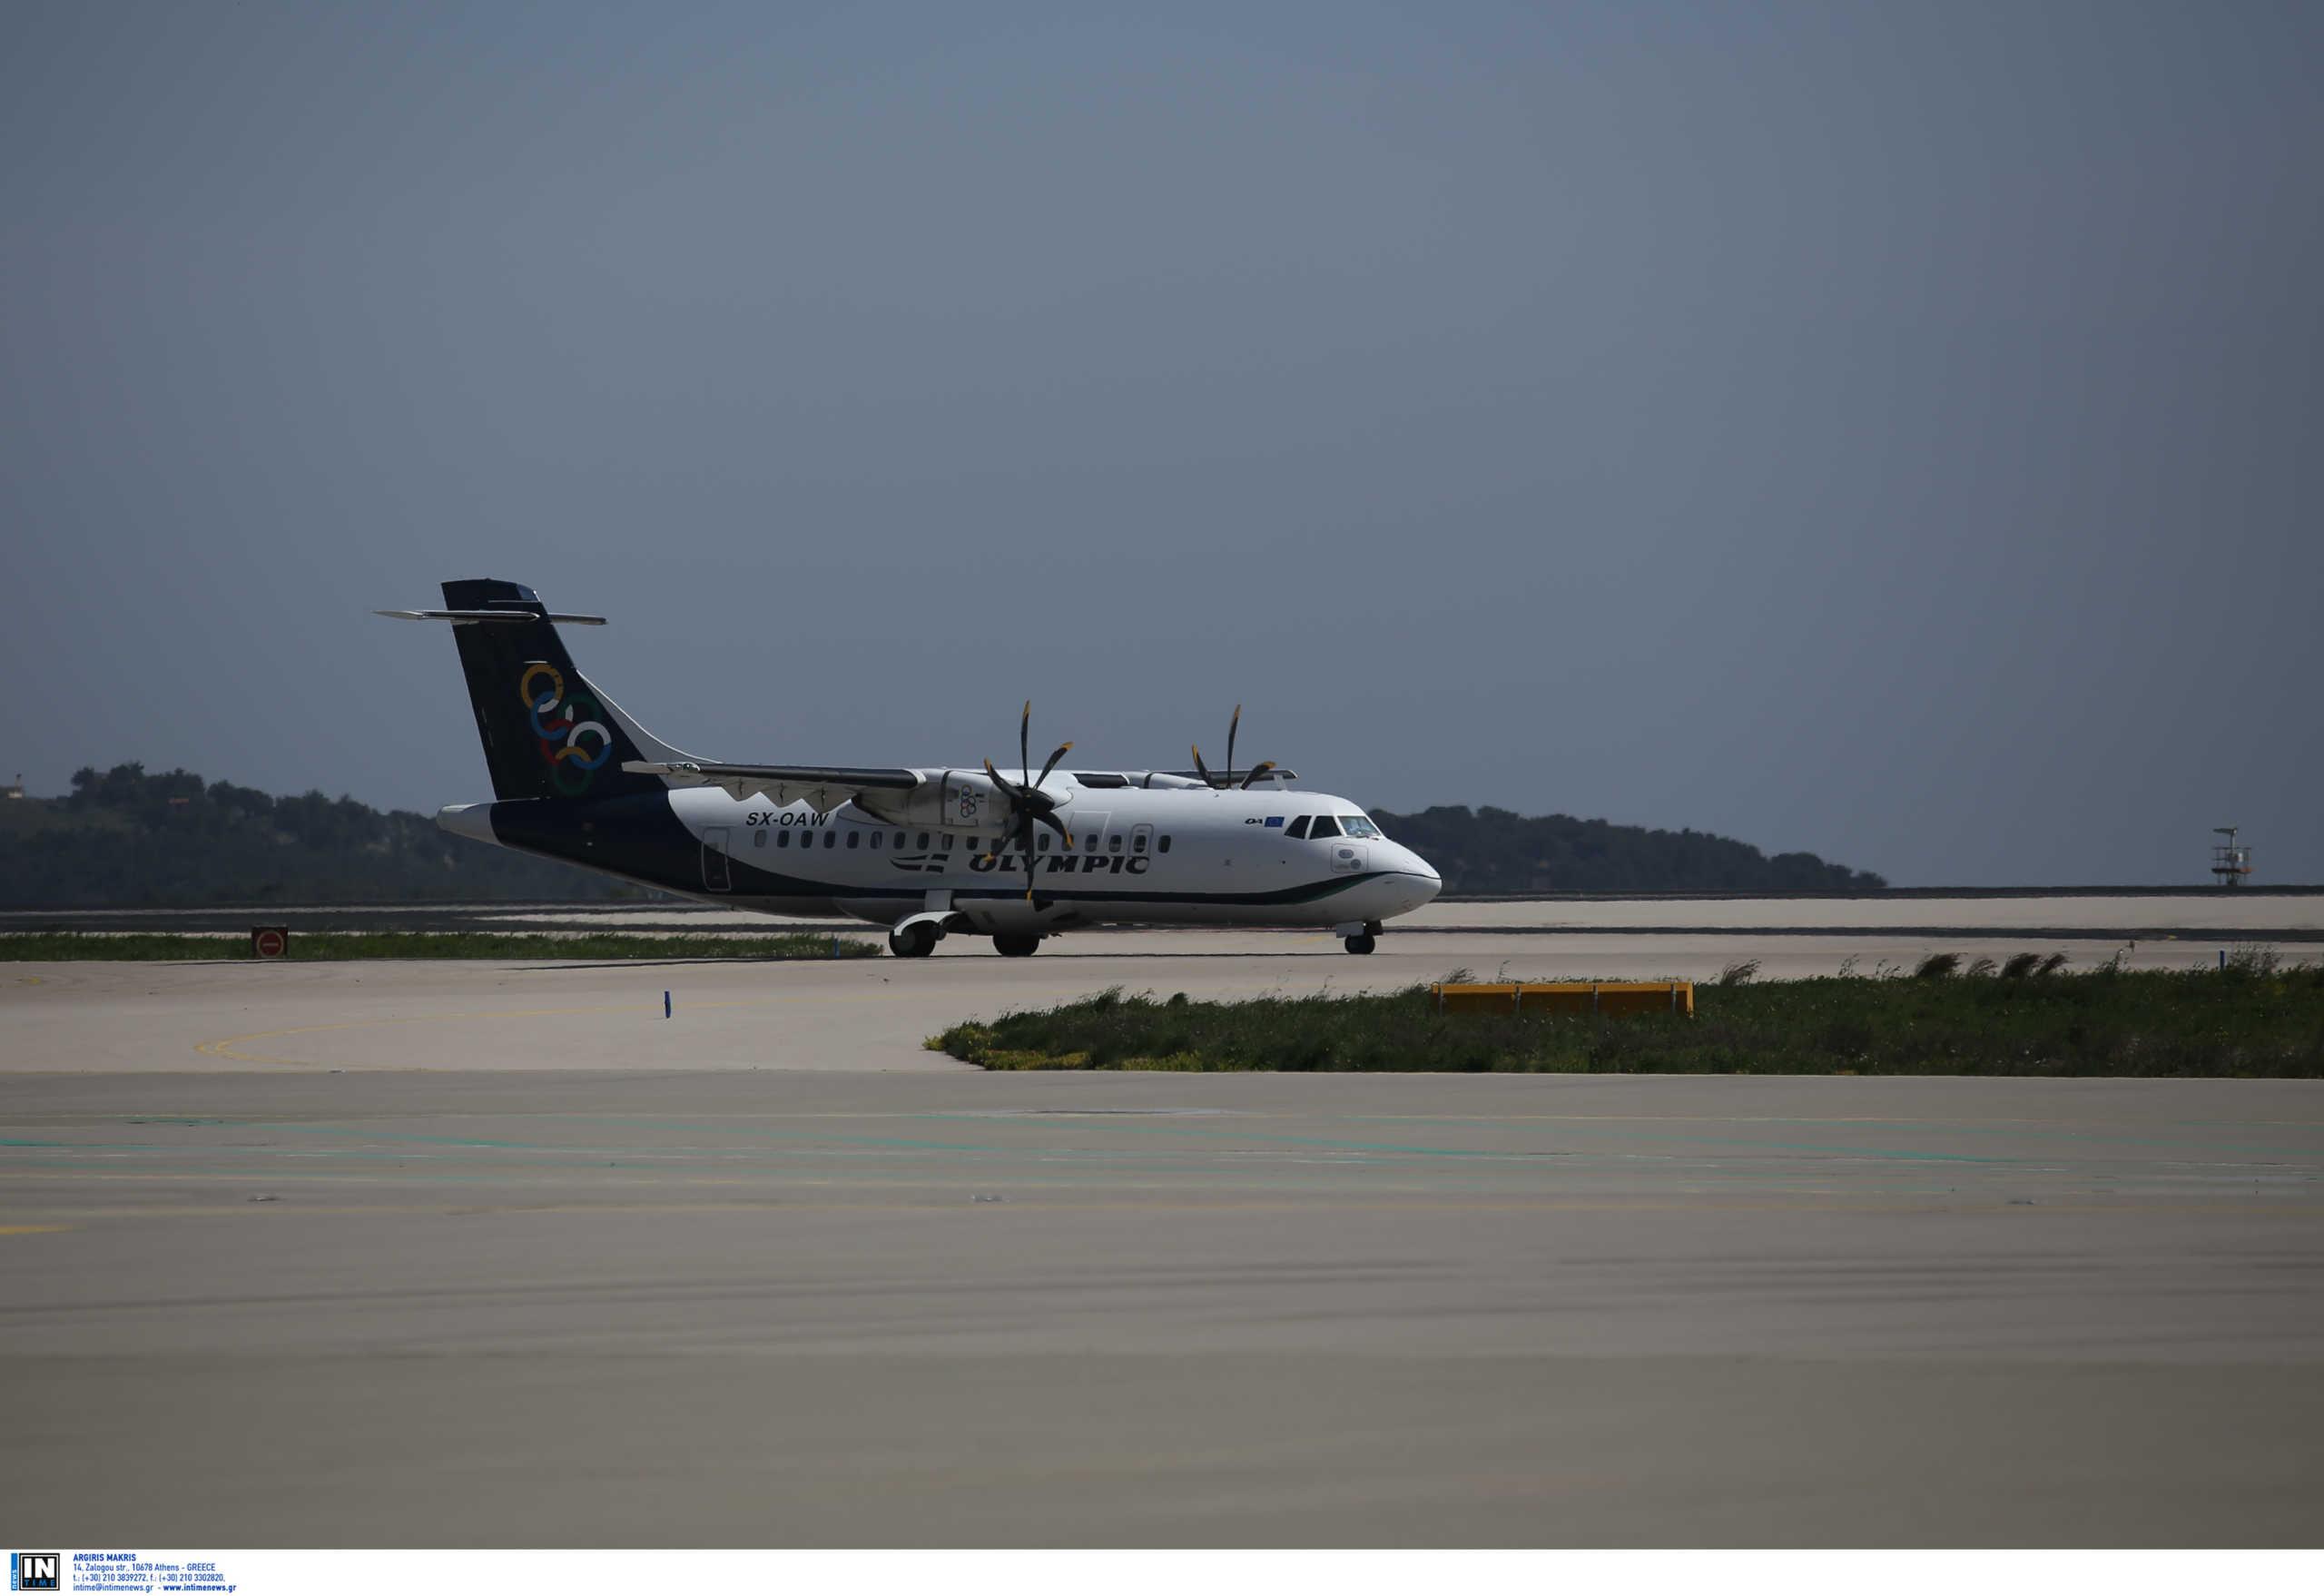 Olympic Air: Ακυρώνονται δεκάδες πτήσεις 21-22 και 23 Σεπτεμβρίου